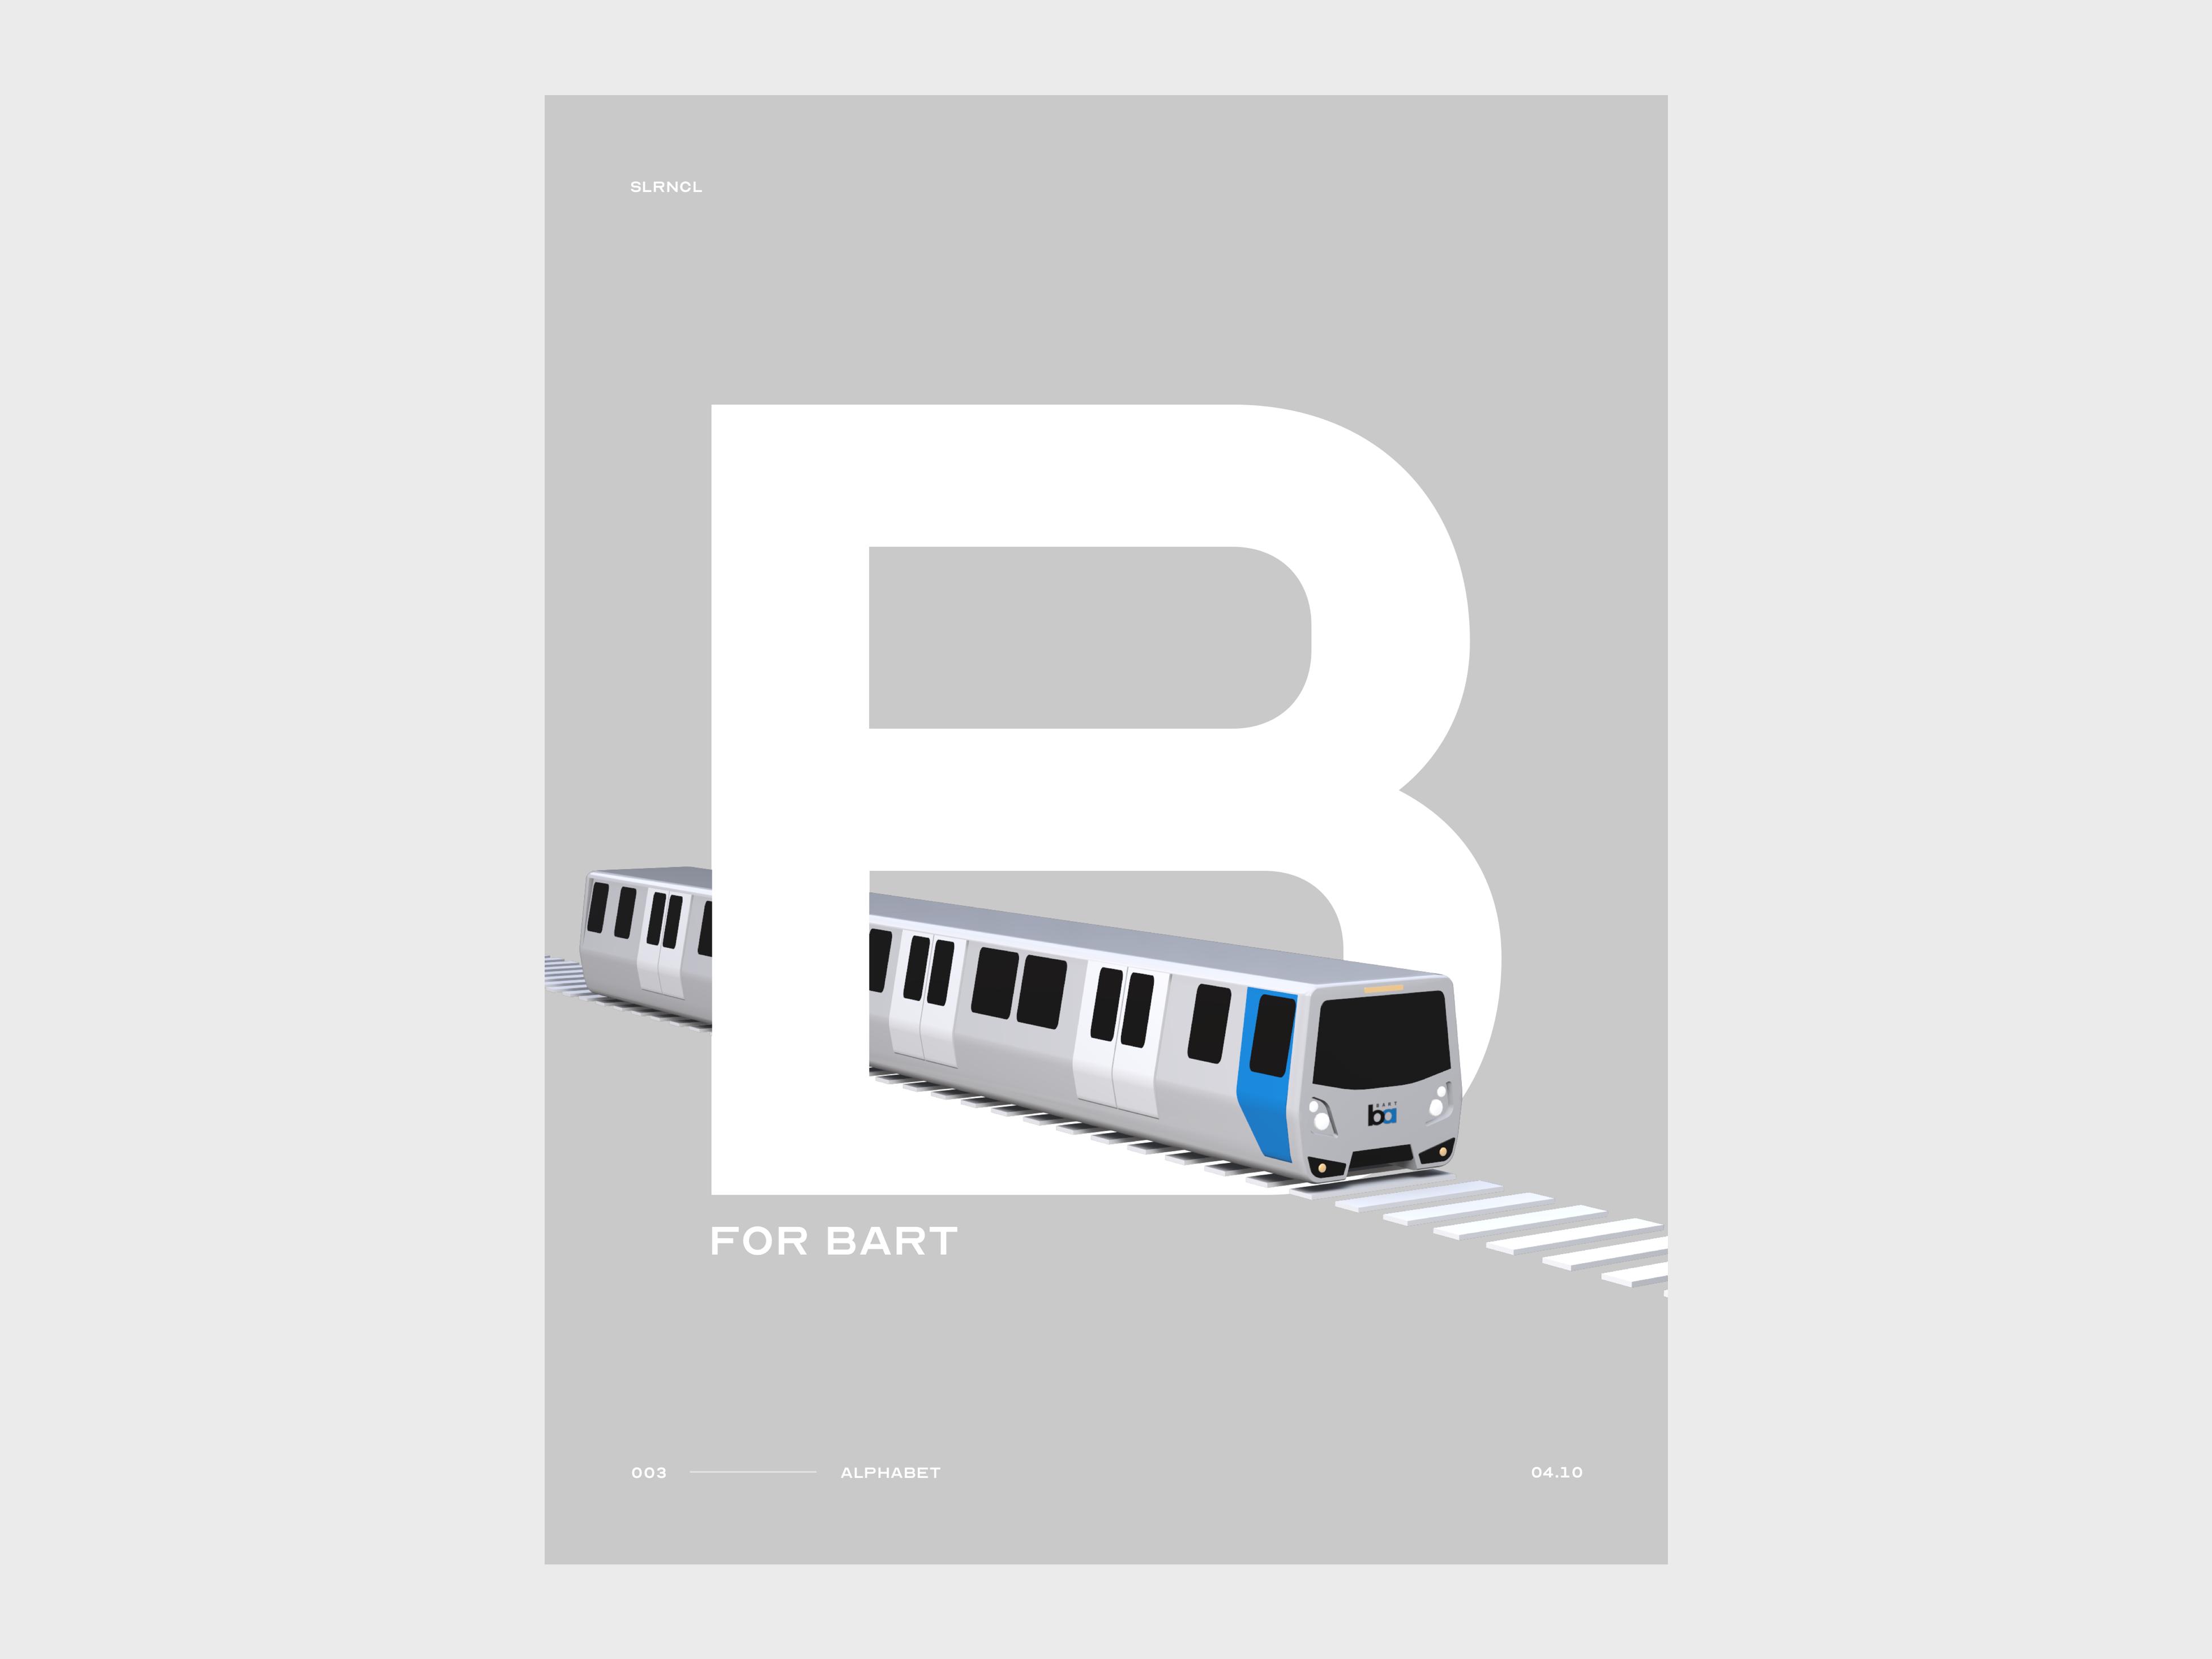 B for bart